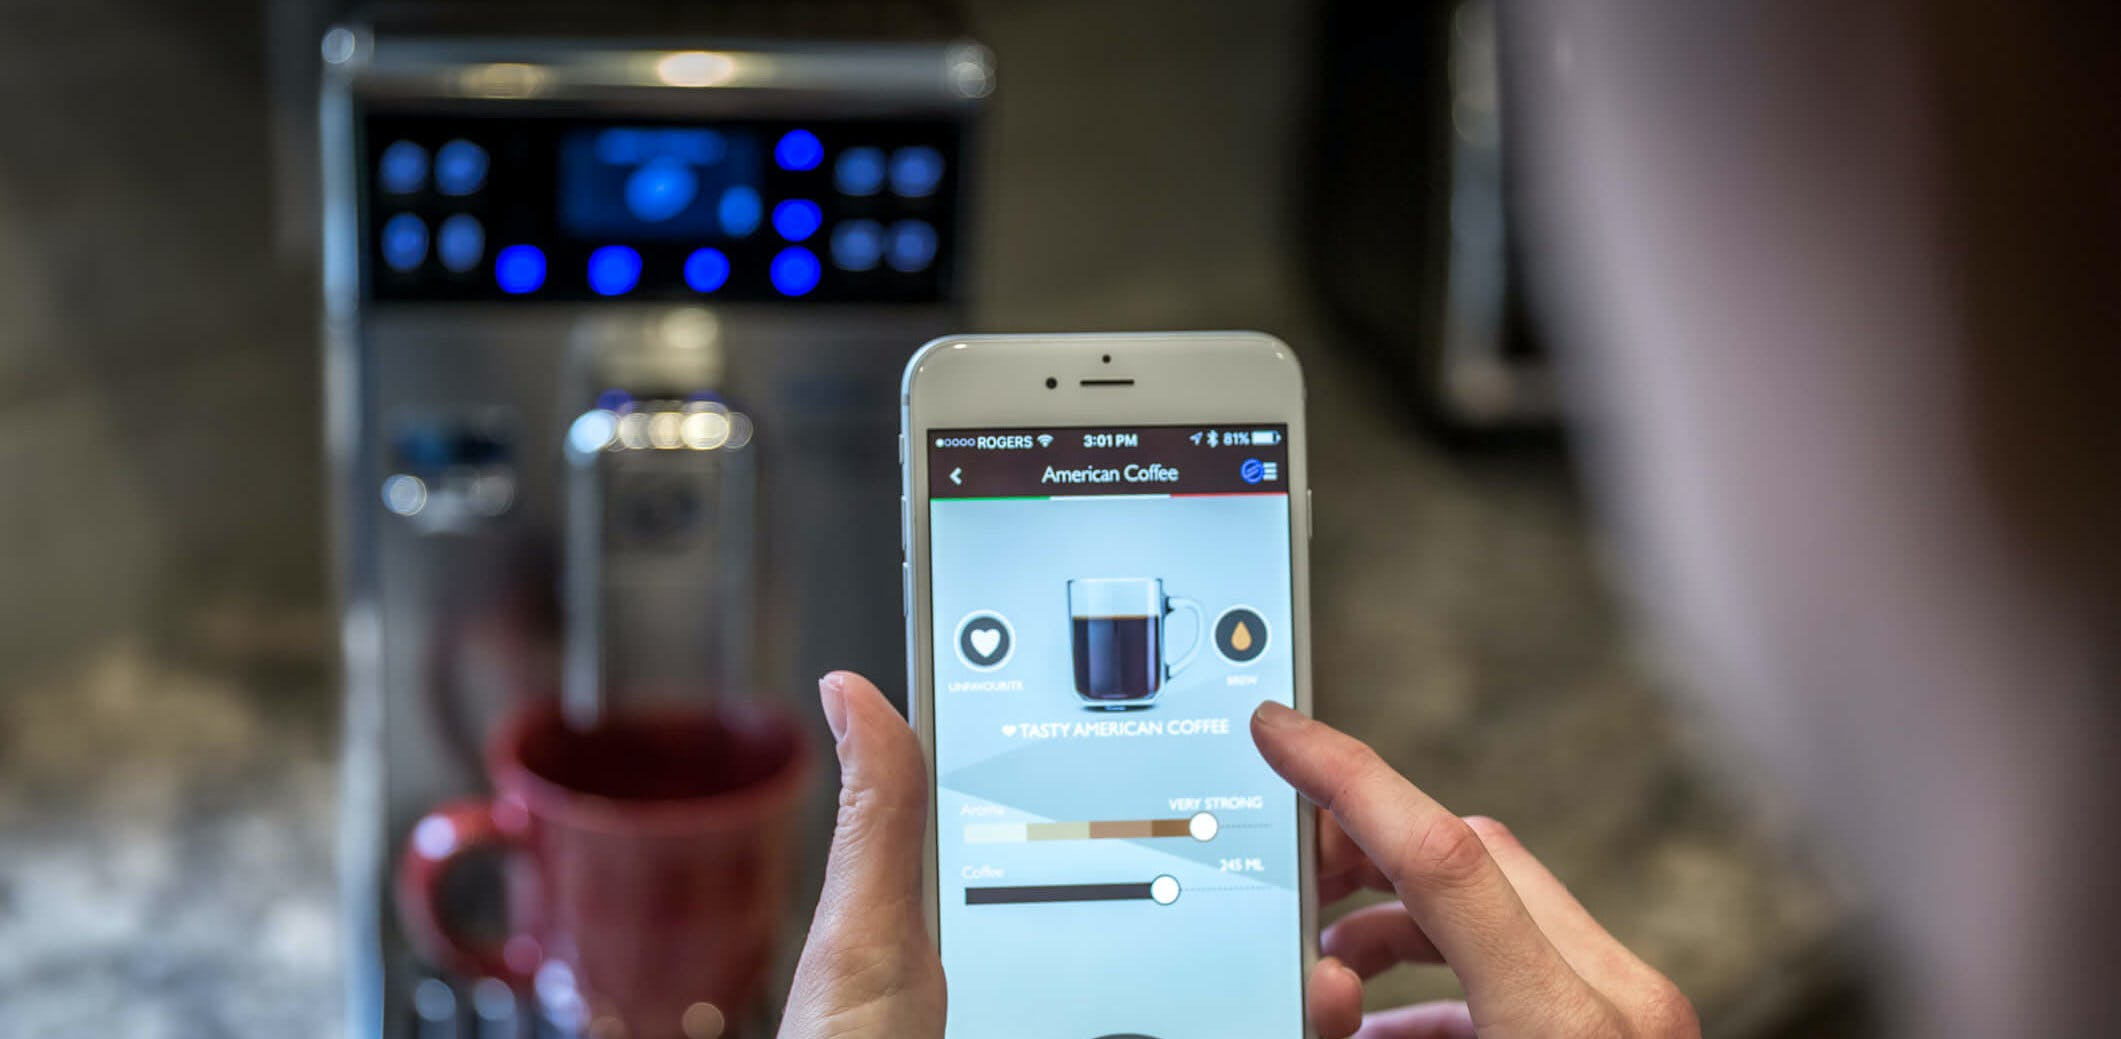 Titelbild-Smartphone-Kaffee-Automat-App-iStock-517344758